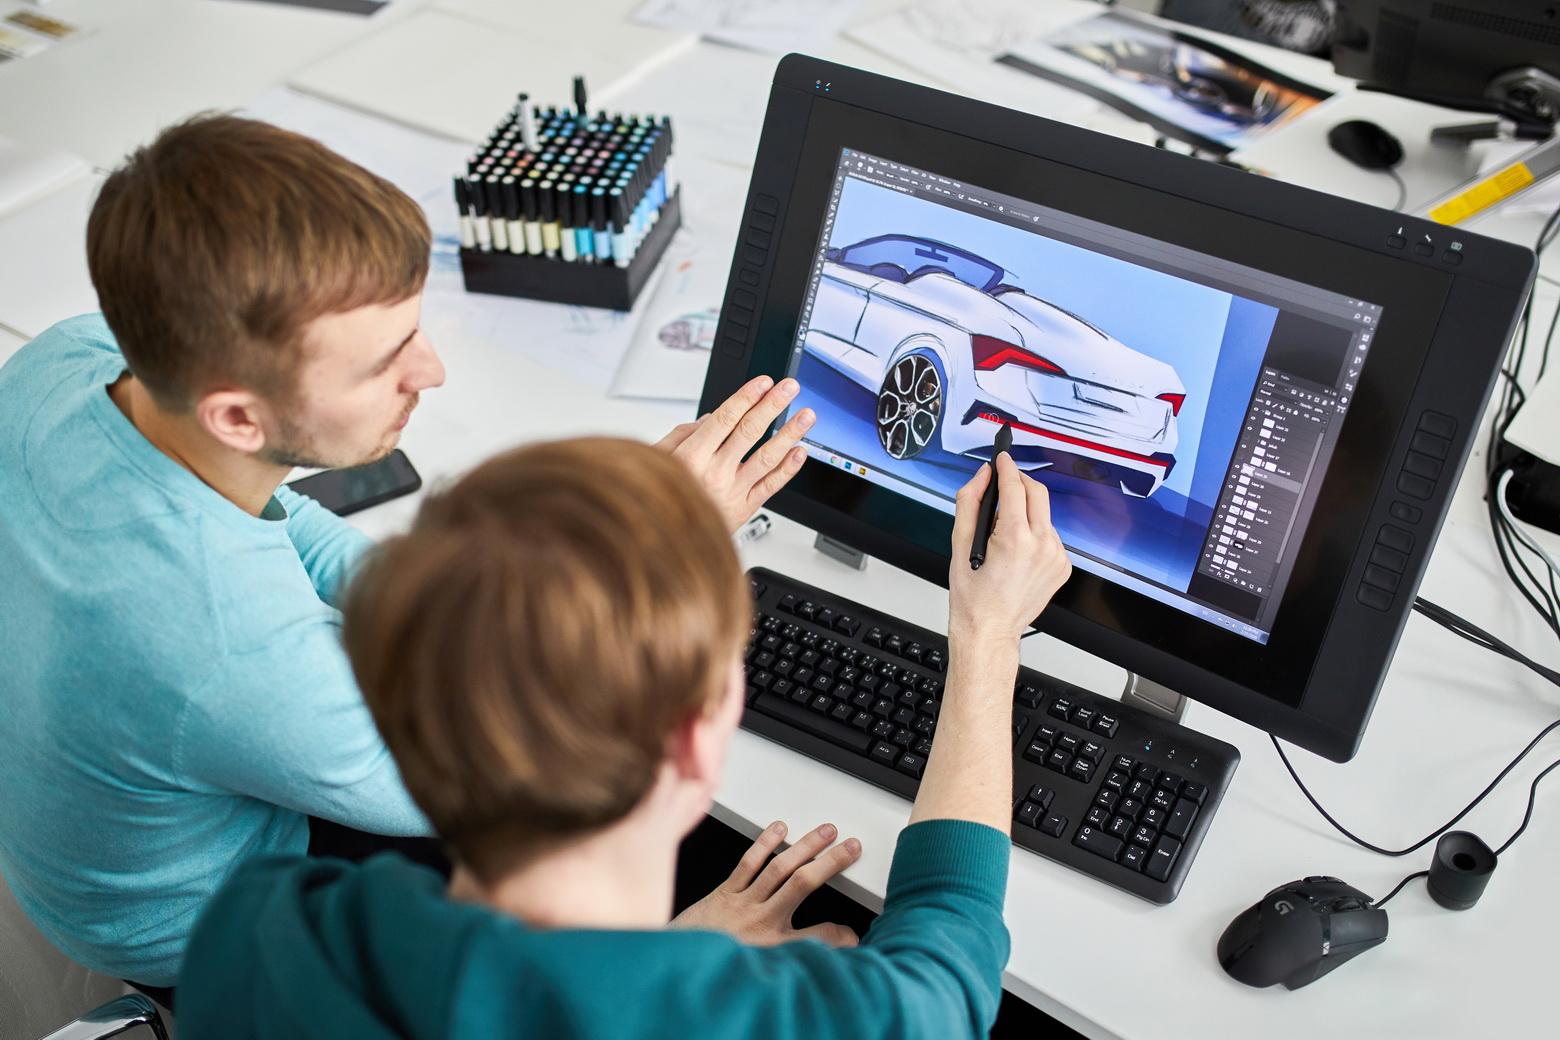 2020-skoda-scala-spyder-student-concept-car-6